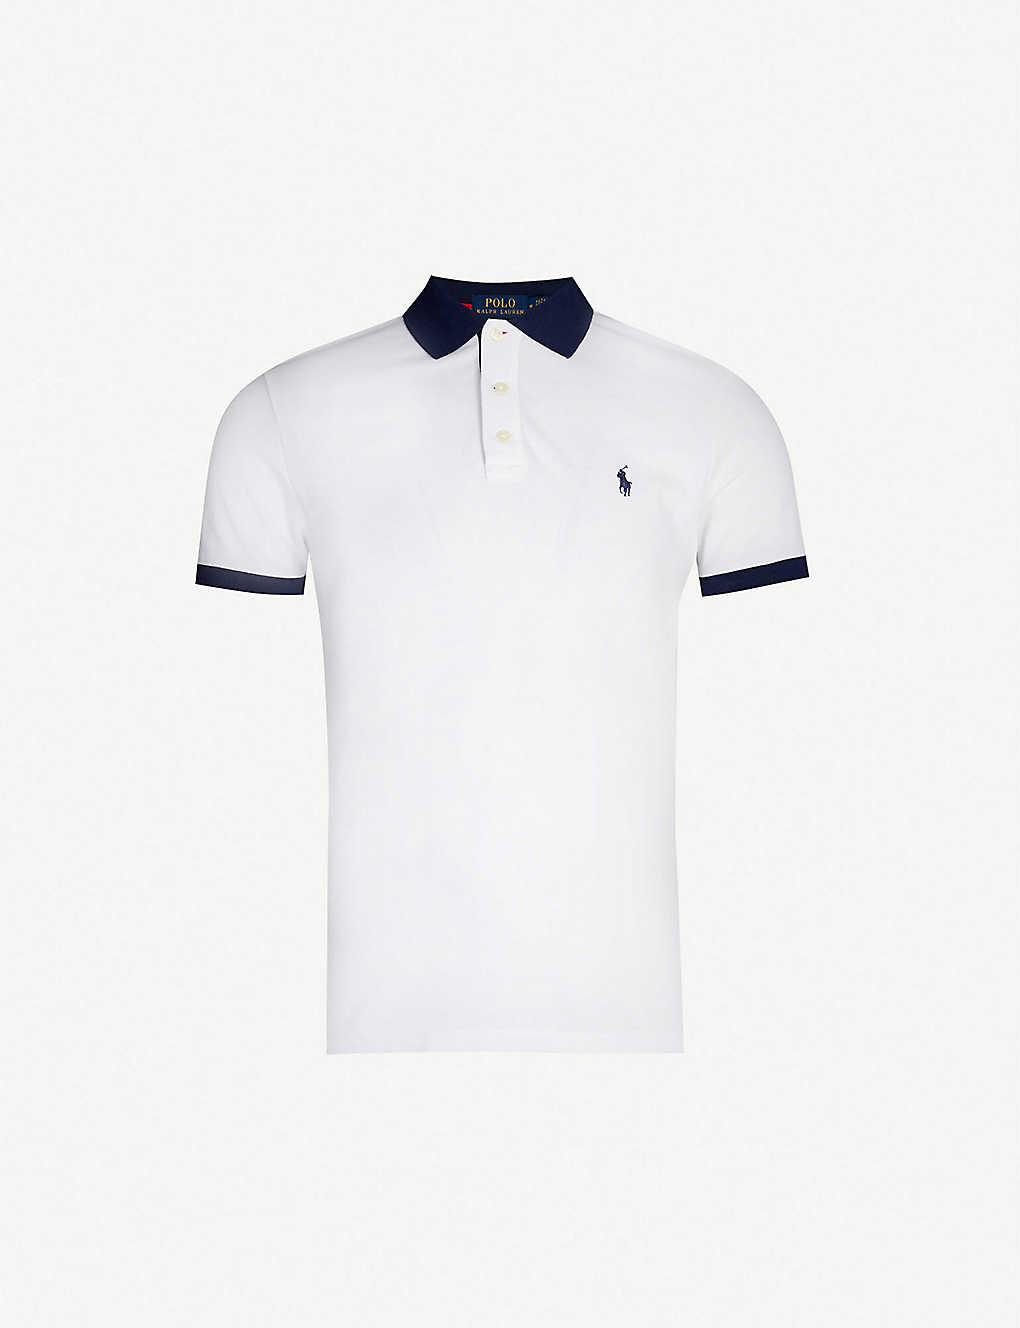 Piqué Contrast Polo Stretch Shirt Cotton RA354Lj